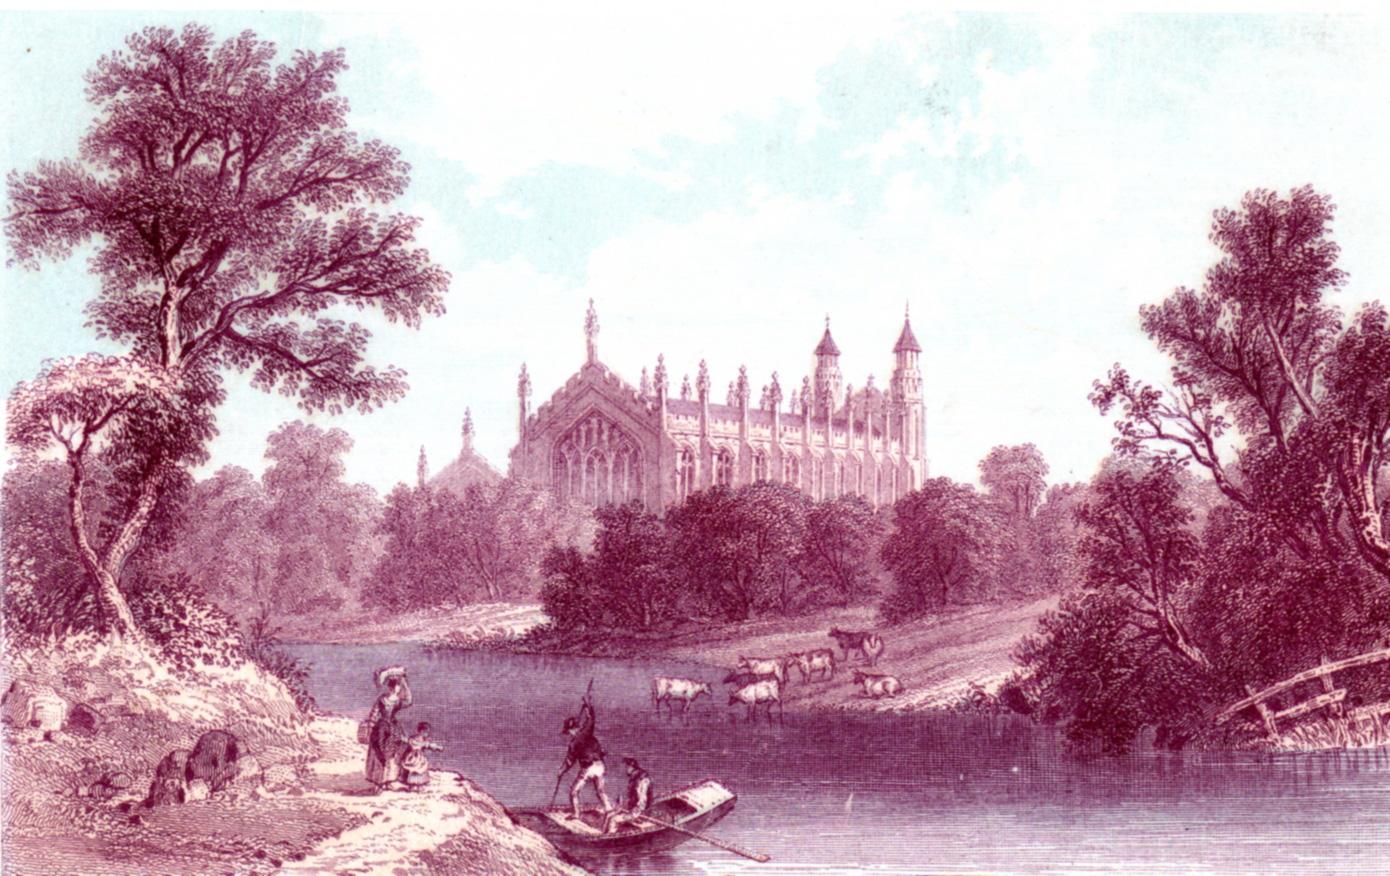 Eton College, Cambridge, Windsor